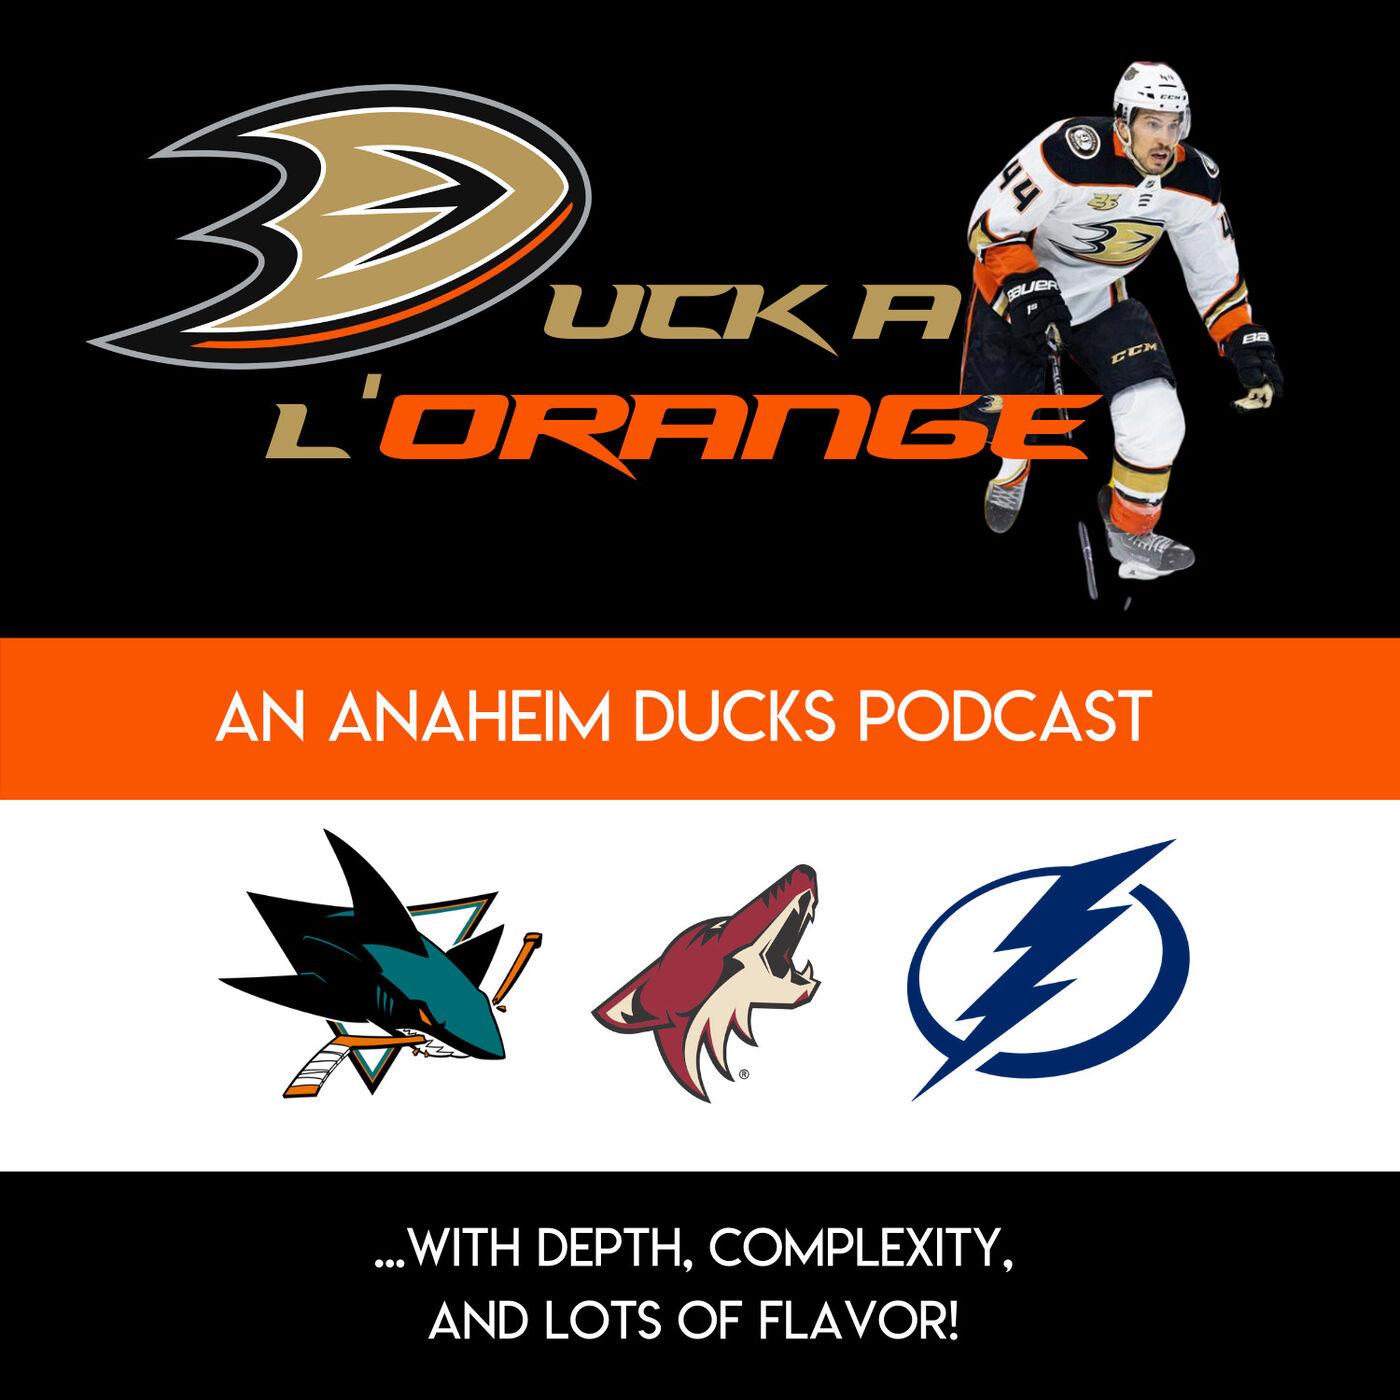 Episode#2: Dallas Eakins: Where's the effort & leadership? Recapping Games vs. SJ, AZ & TBL w/ Ducks Sitting @ 20-26-5 (7th Pacific)